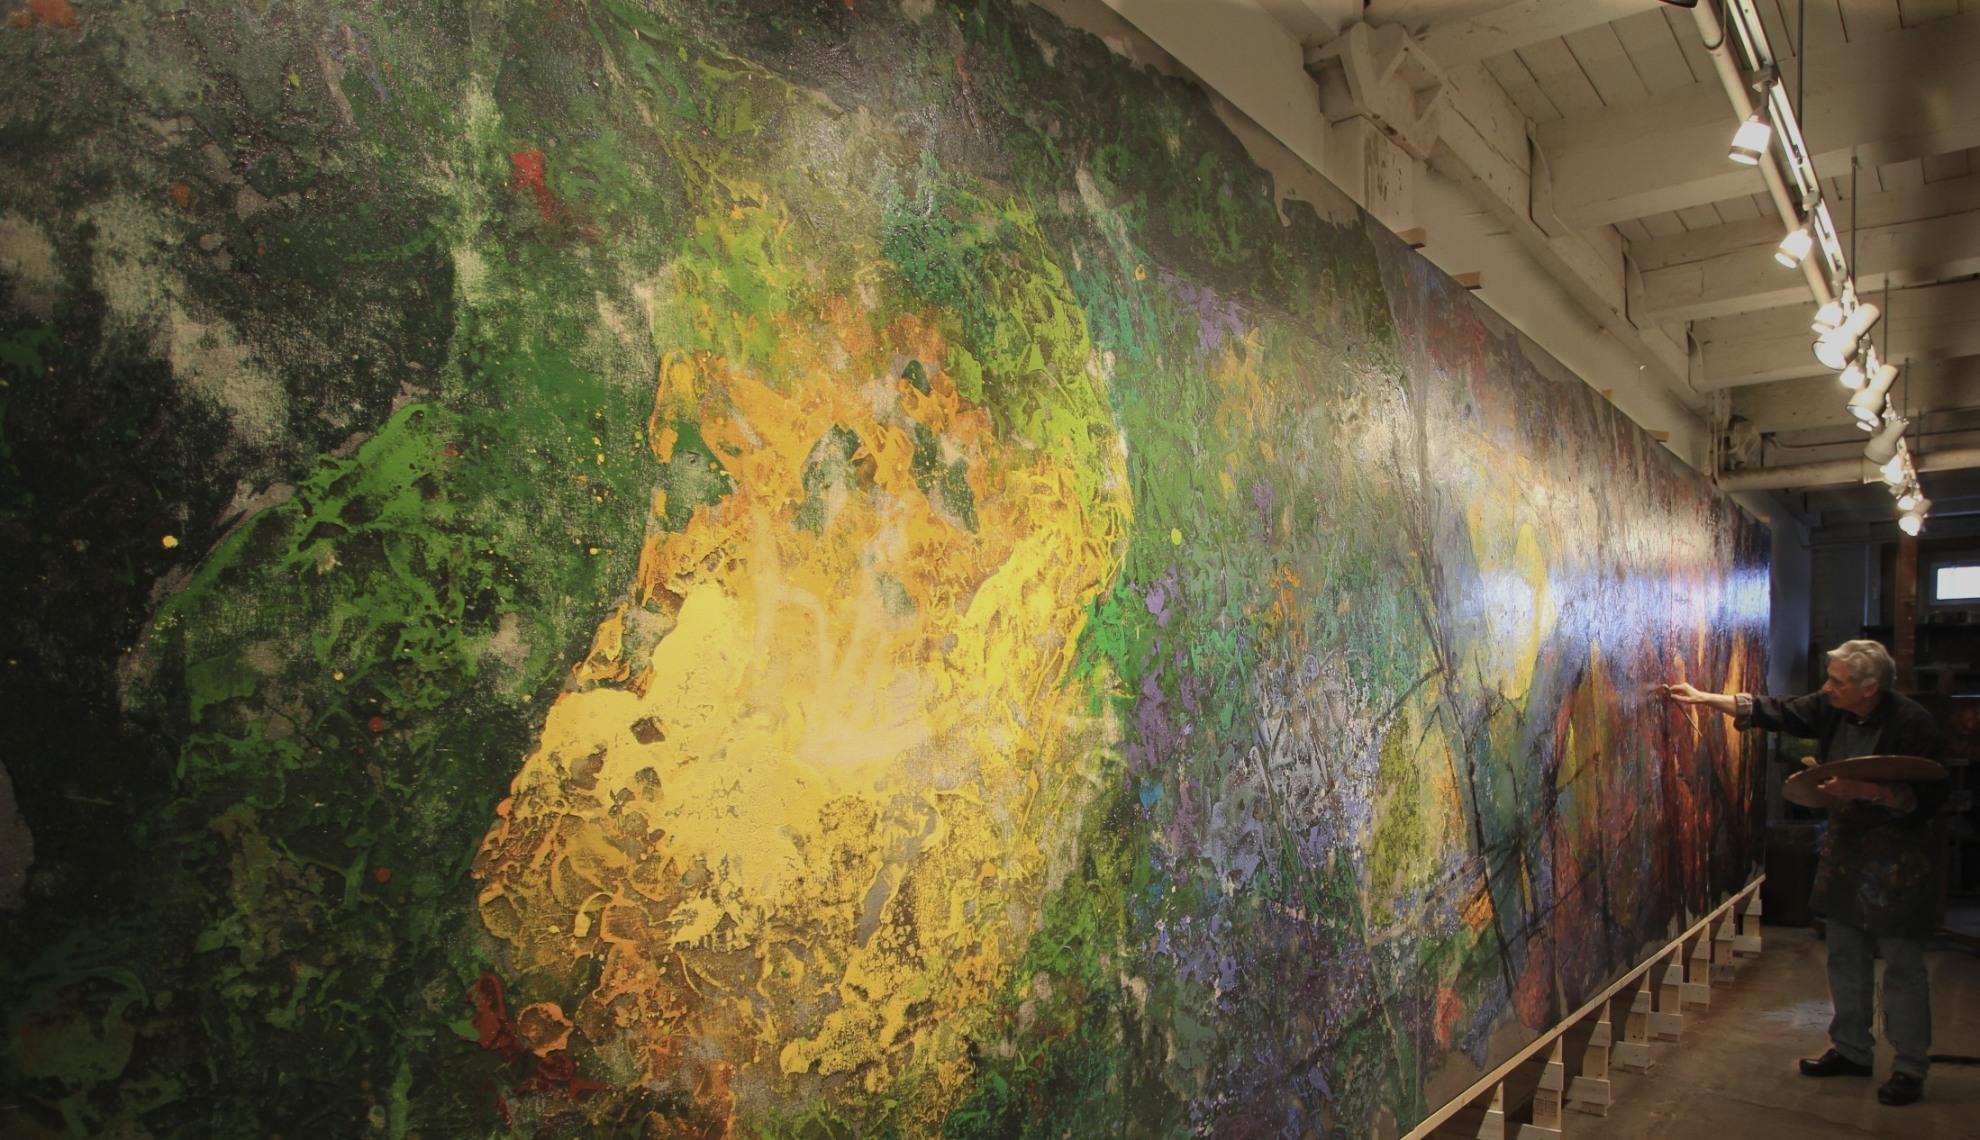 Steve Carpenter - The Four Seasons Mural at Village Gate - Creation ...